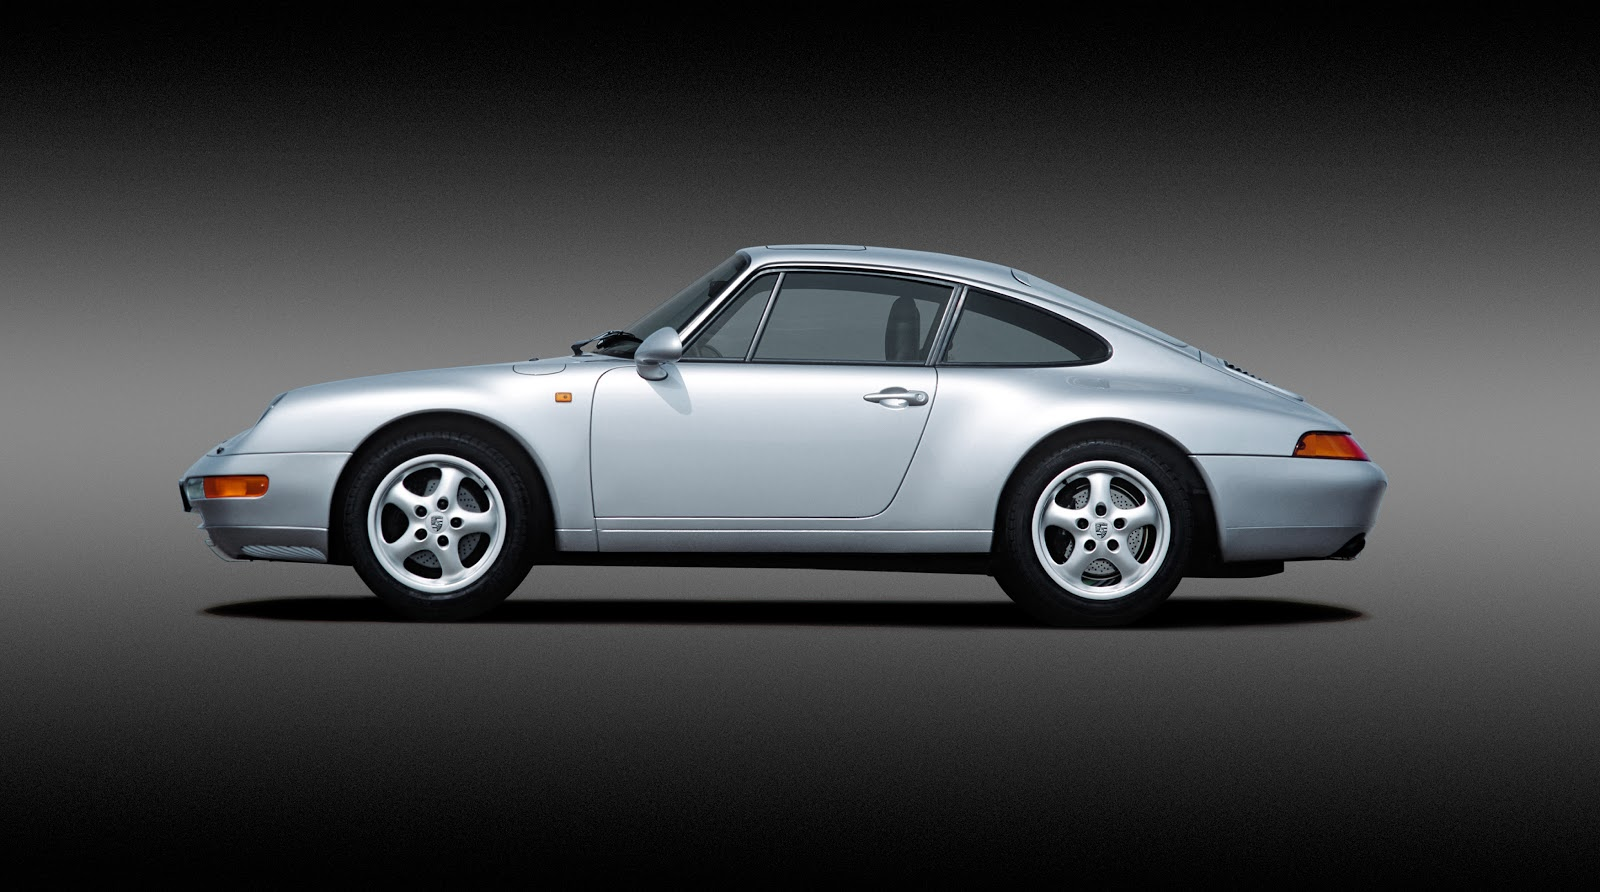 P13 0158 a4 rgb 1 Porsche 993, η τελευταία των αερόψυκτων 911 Classic, history, Porsche, Porsche 911, zblog